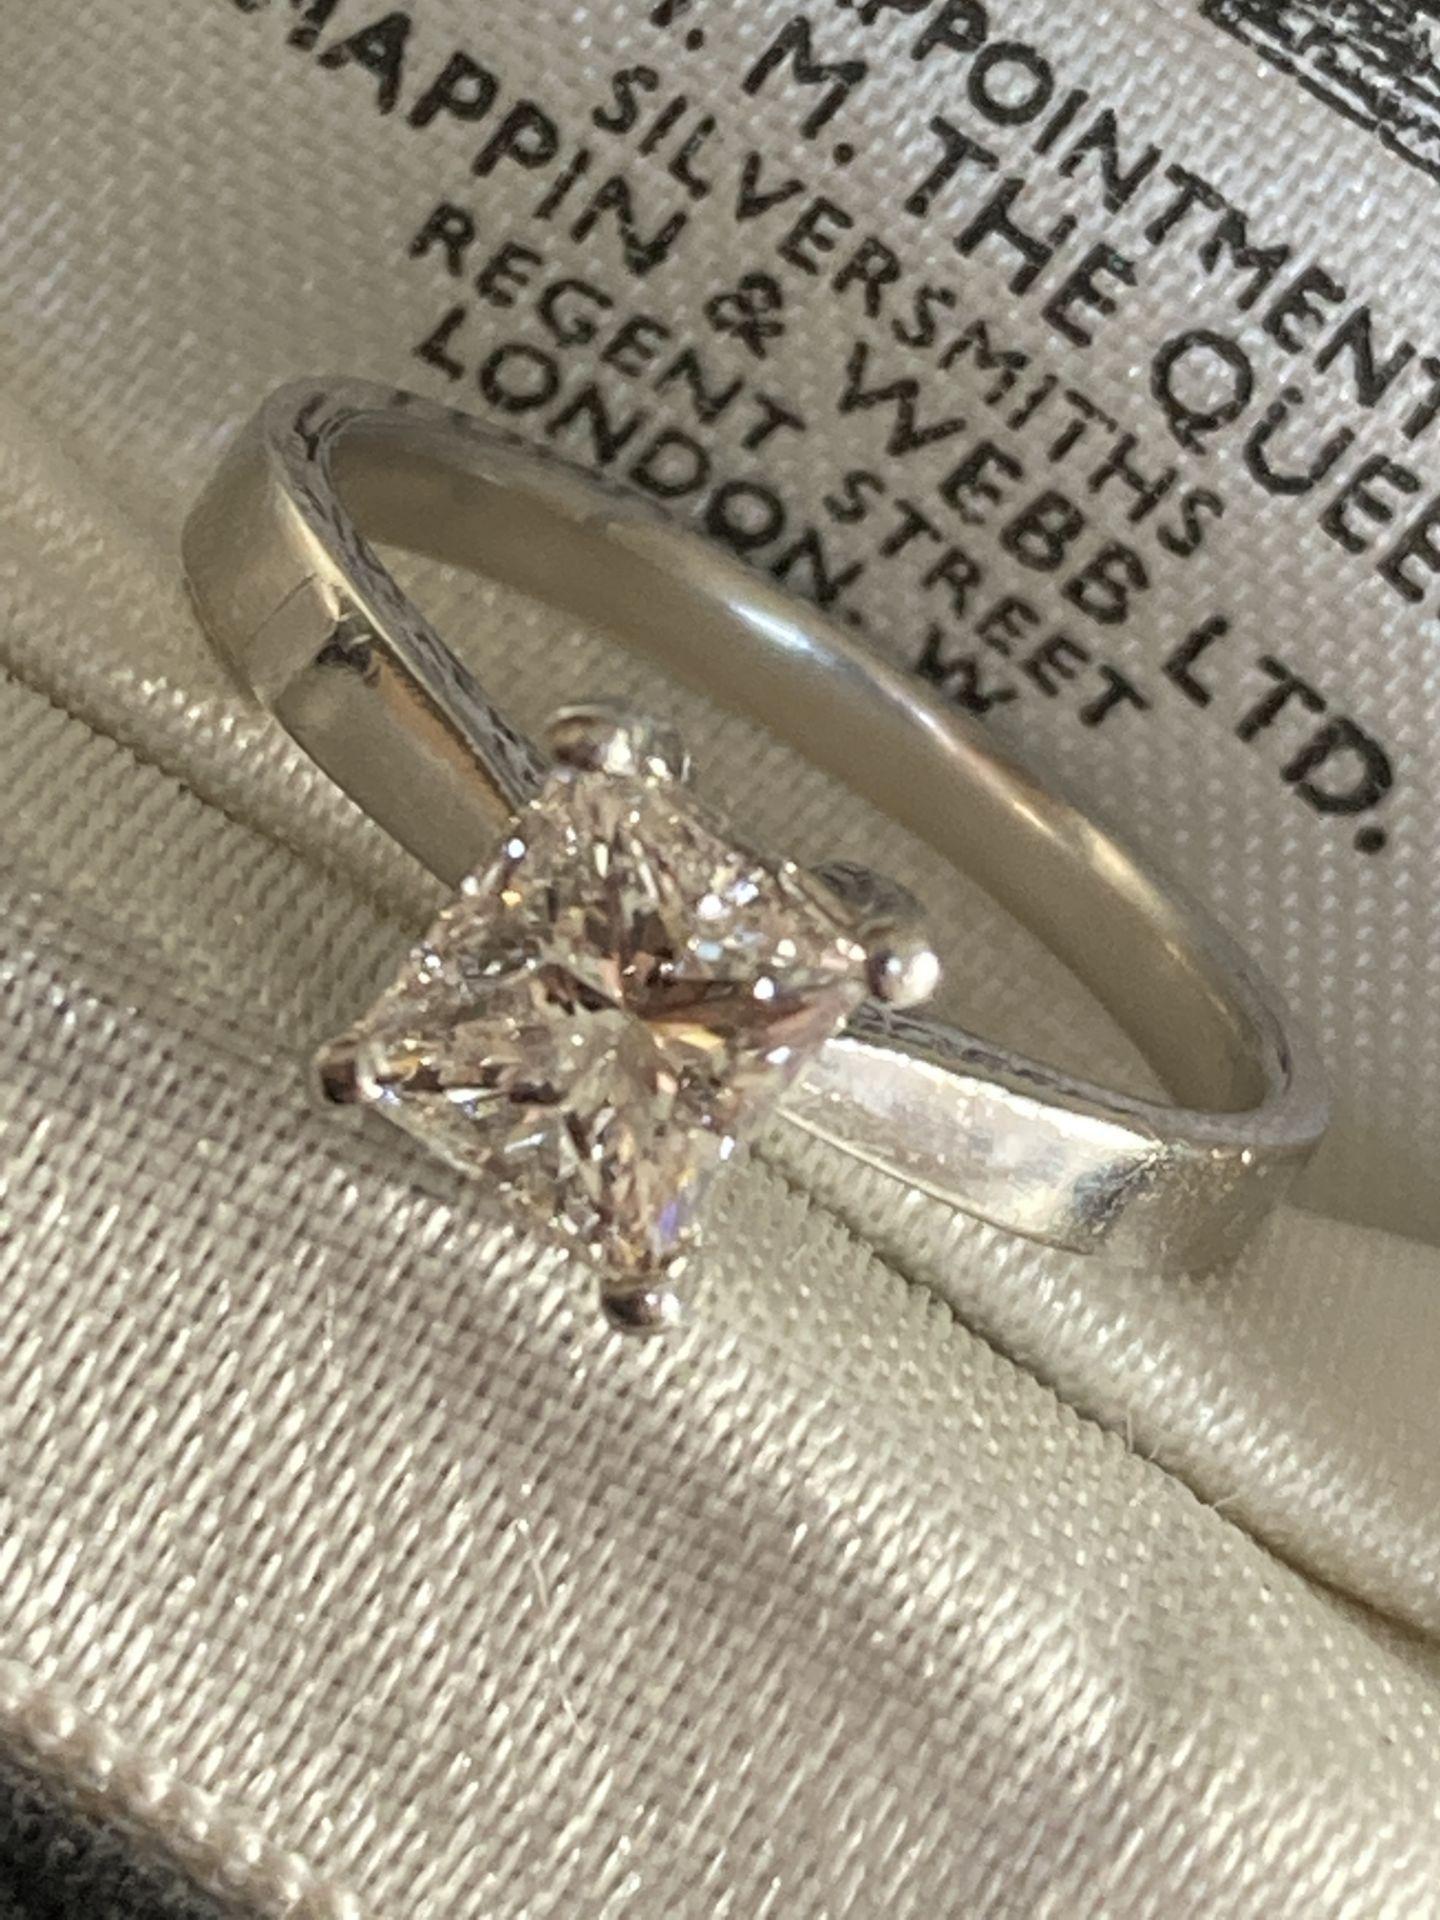 1.04CT (VS/F) PLATINUM PRINCESS CUT DIAMOND SOLITAIRE RING (CERTIFICATED) - Image 8 of 10